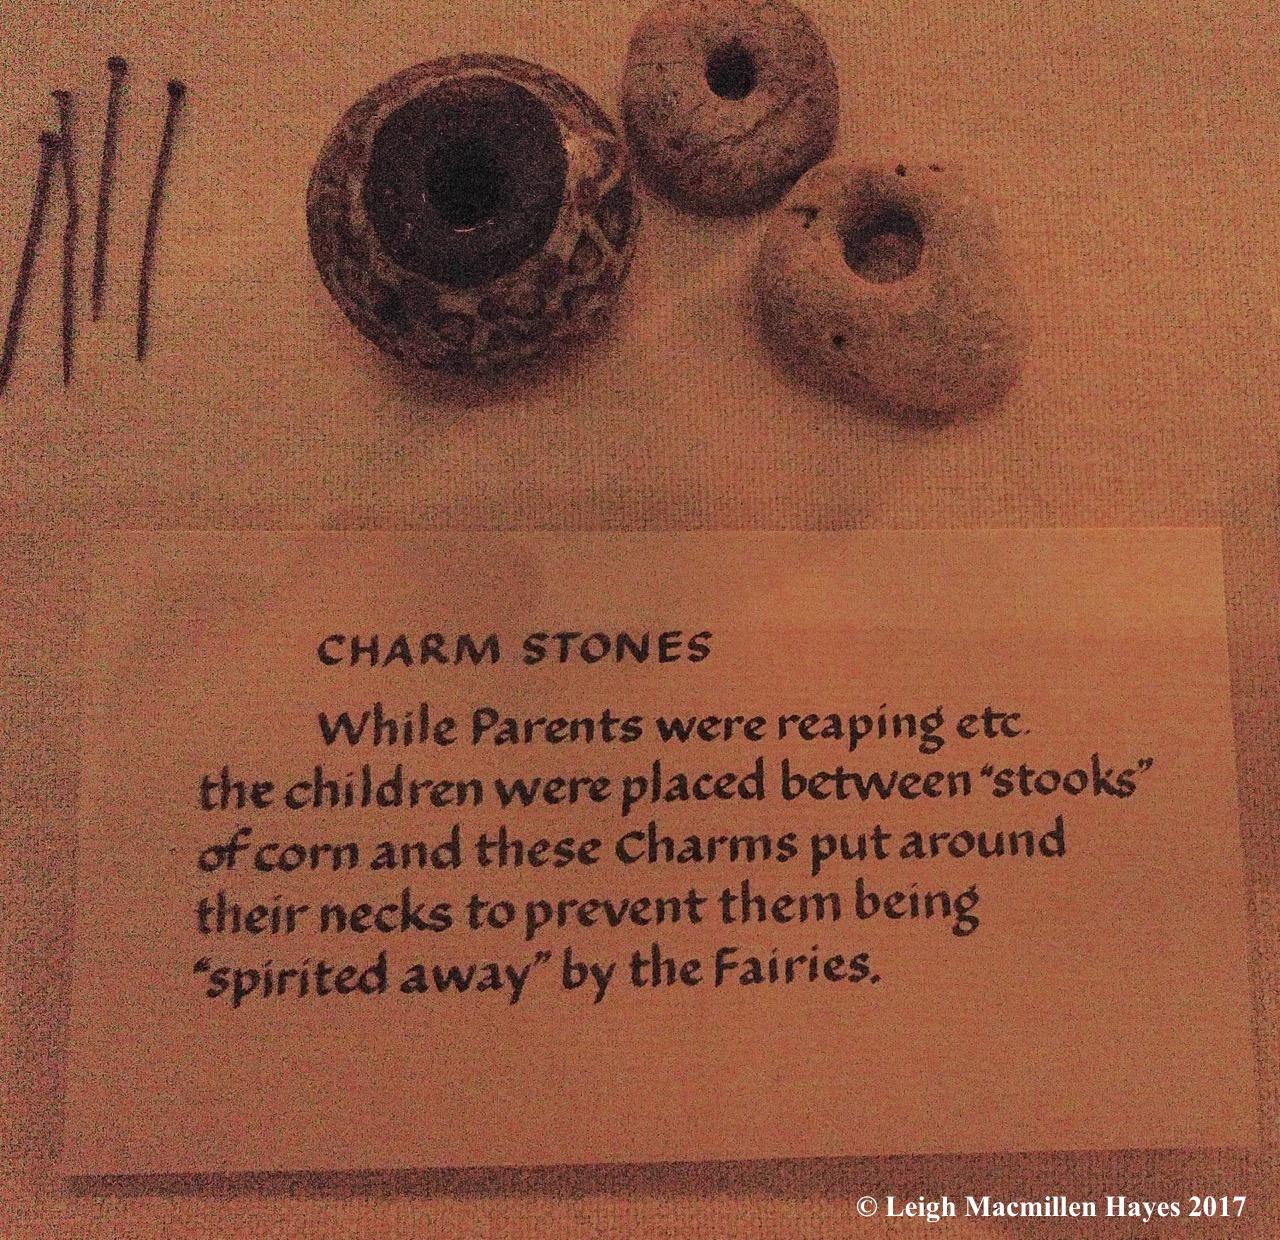 s-charm stones and fairies (1)